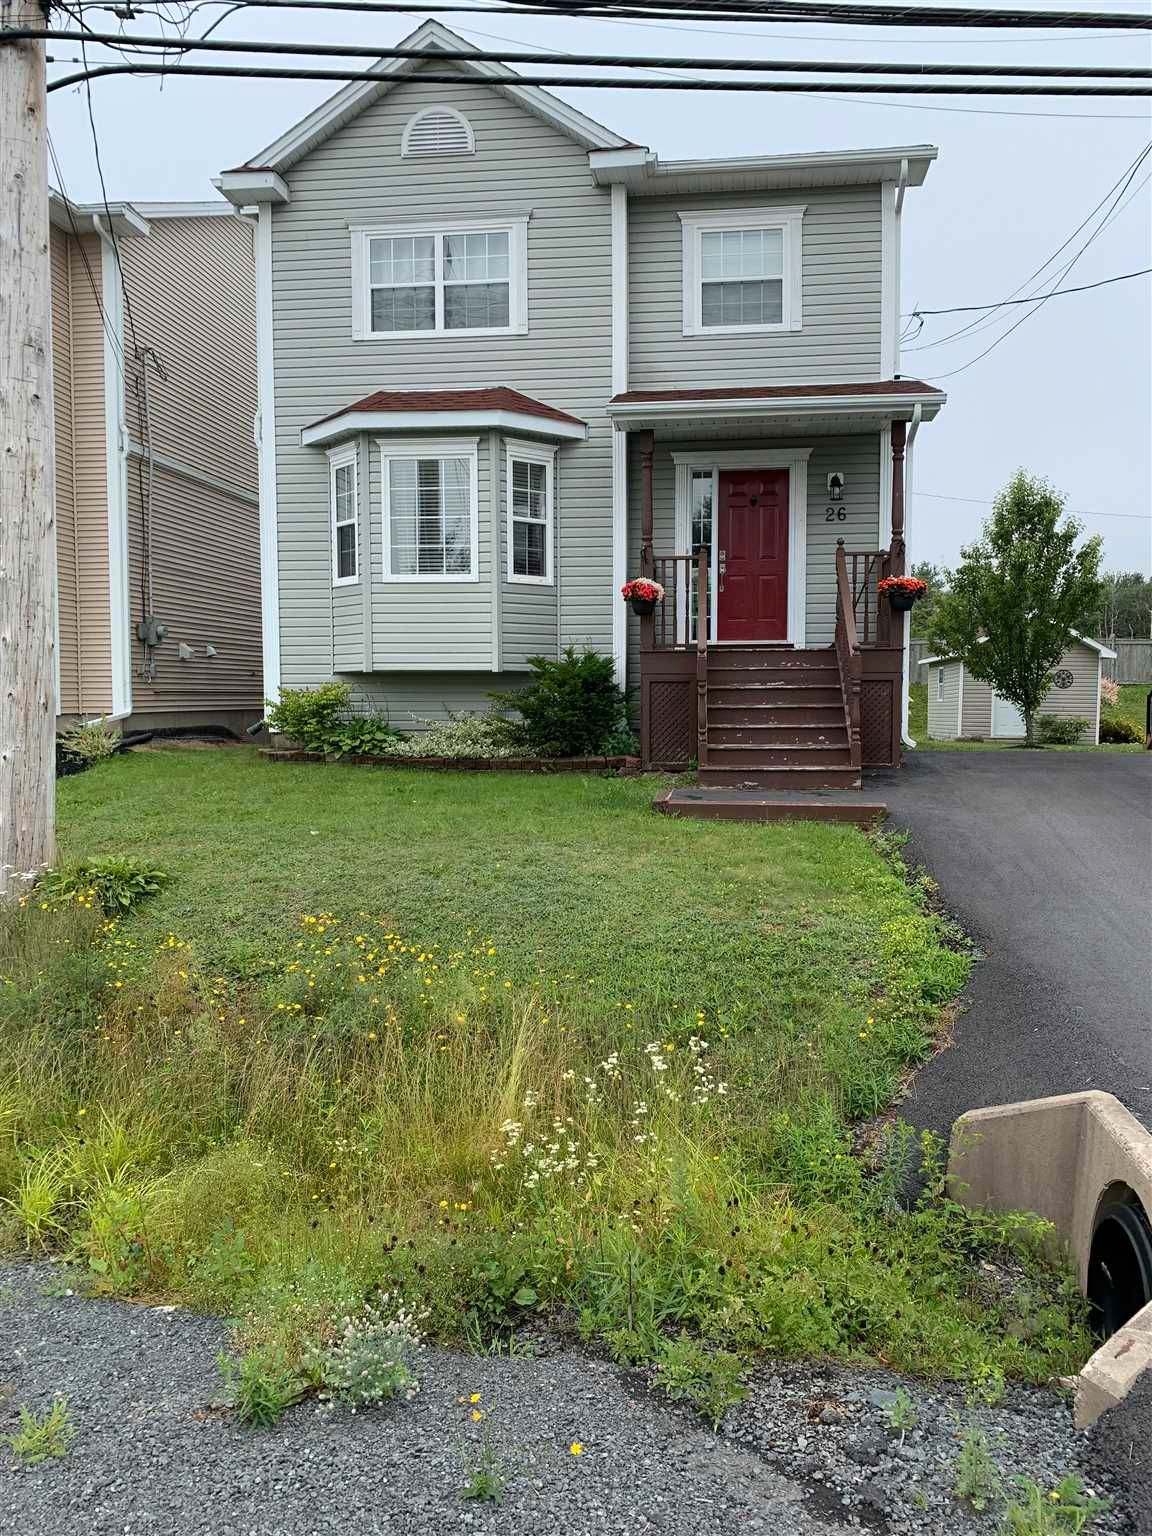 Main Photo: 26 Trinity Way in Timberlea: 40-Timberlea, Prospect, St. Margaret`S Bay Residential for sale (Halifax-Dartmouth)  : MLS®# 202118575